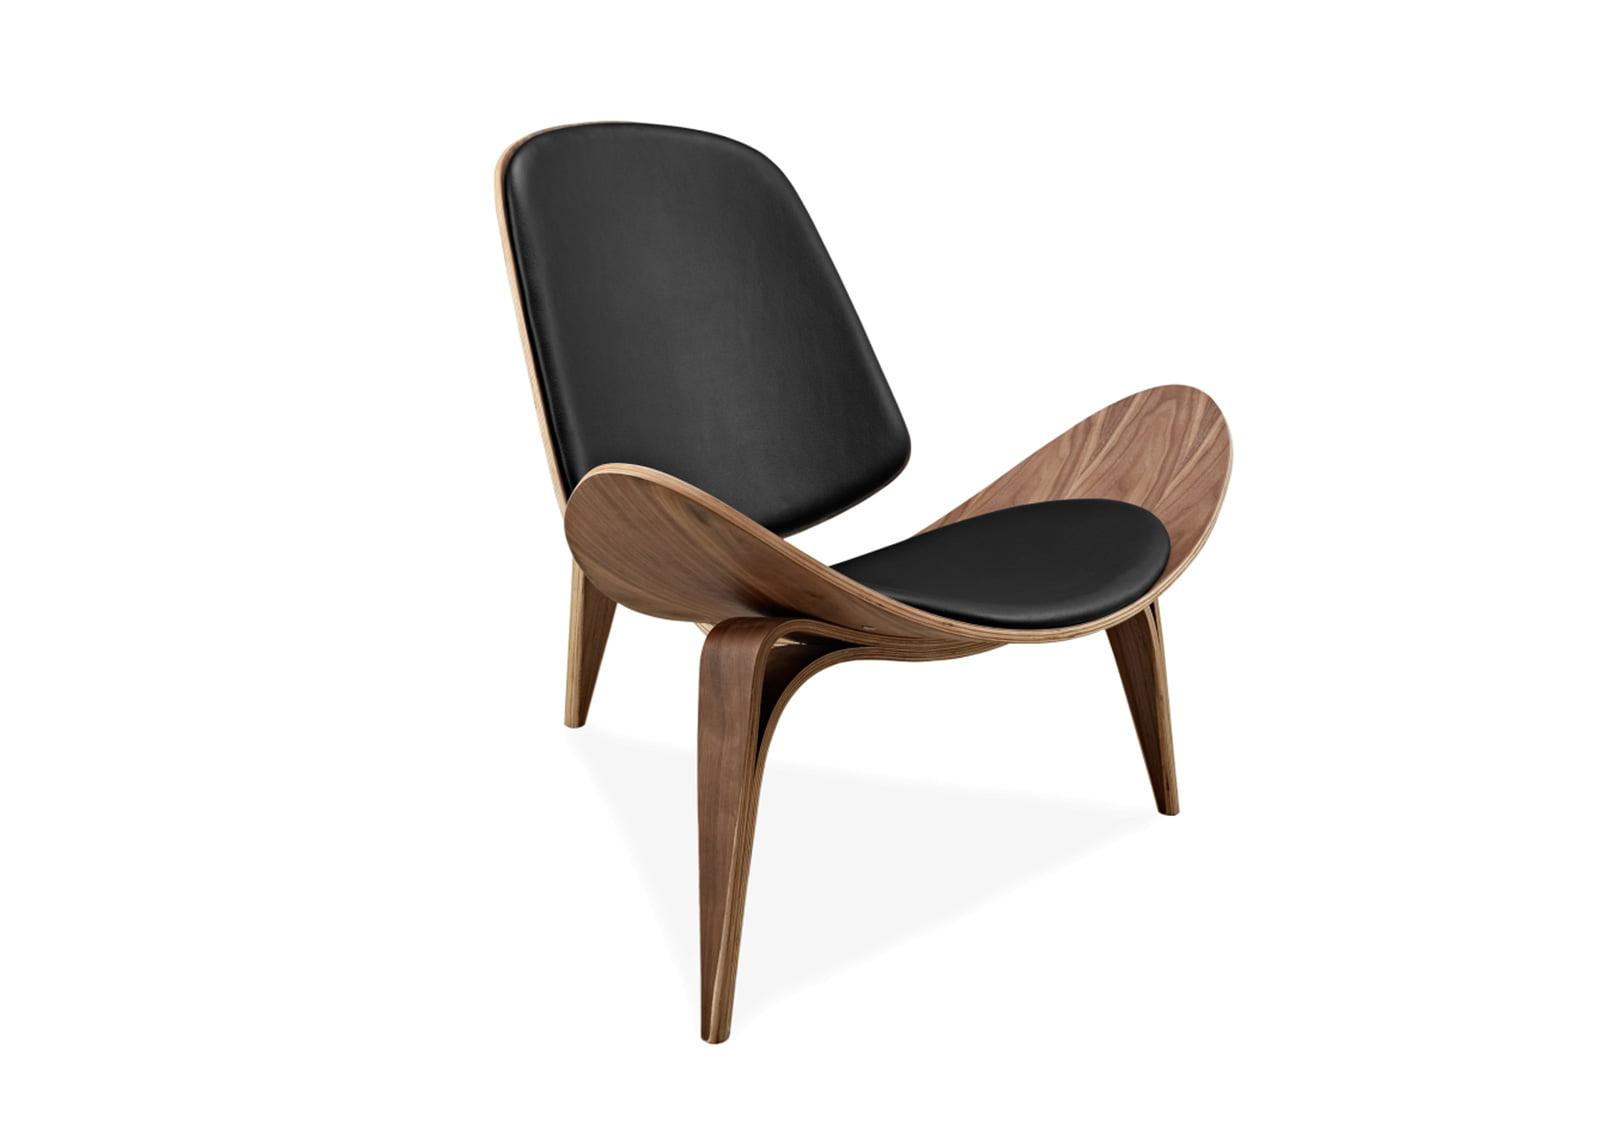 blk vinyl hans eei wal j products emfurn chair shell replica style wegner